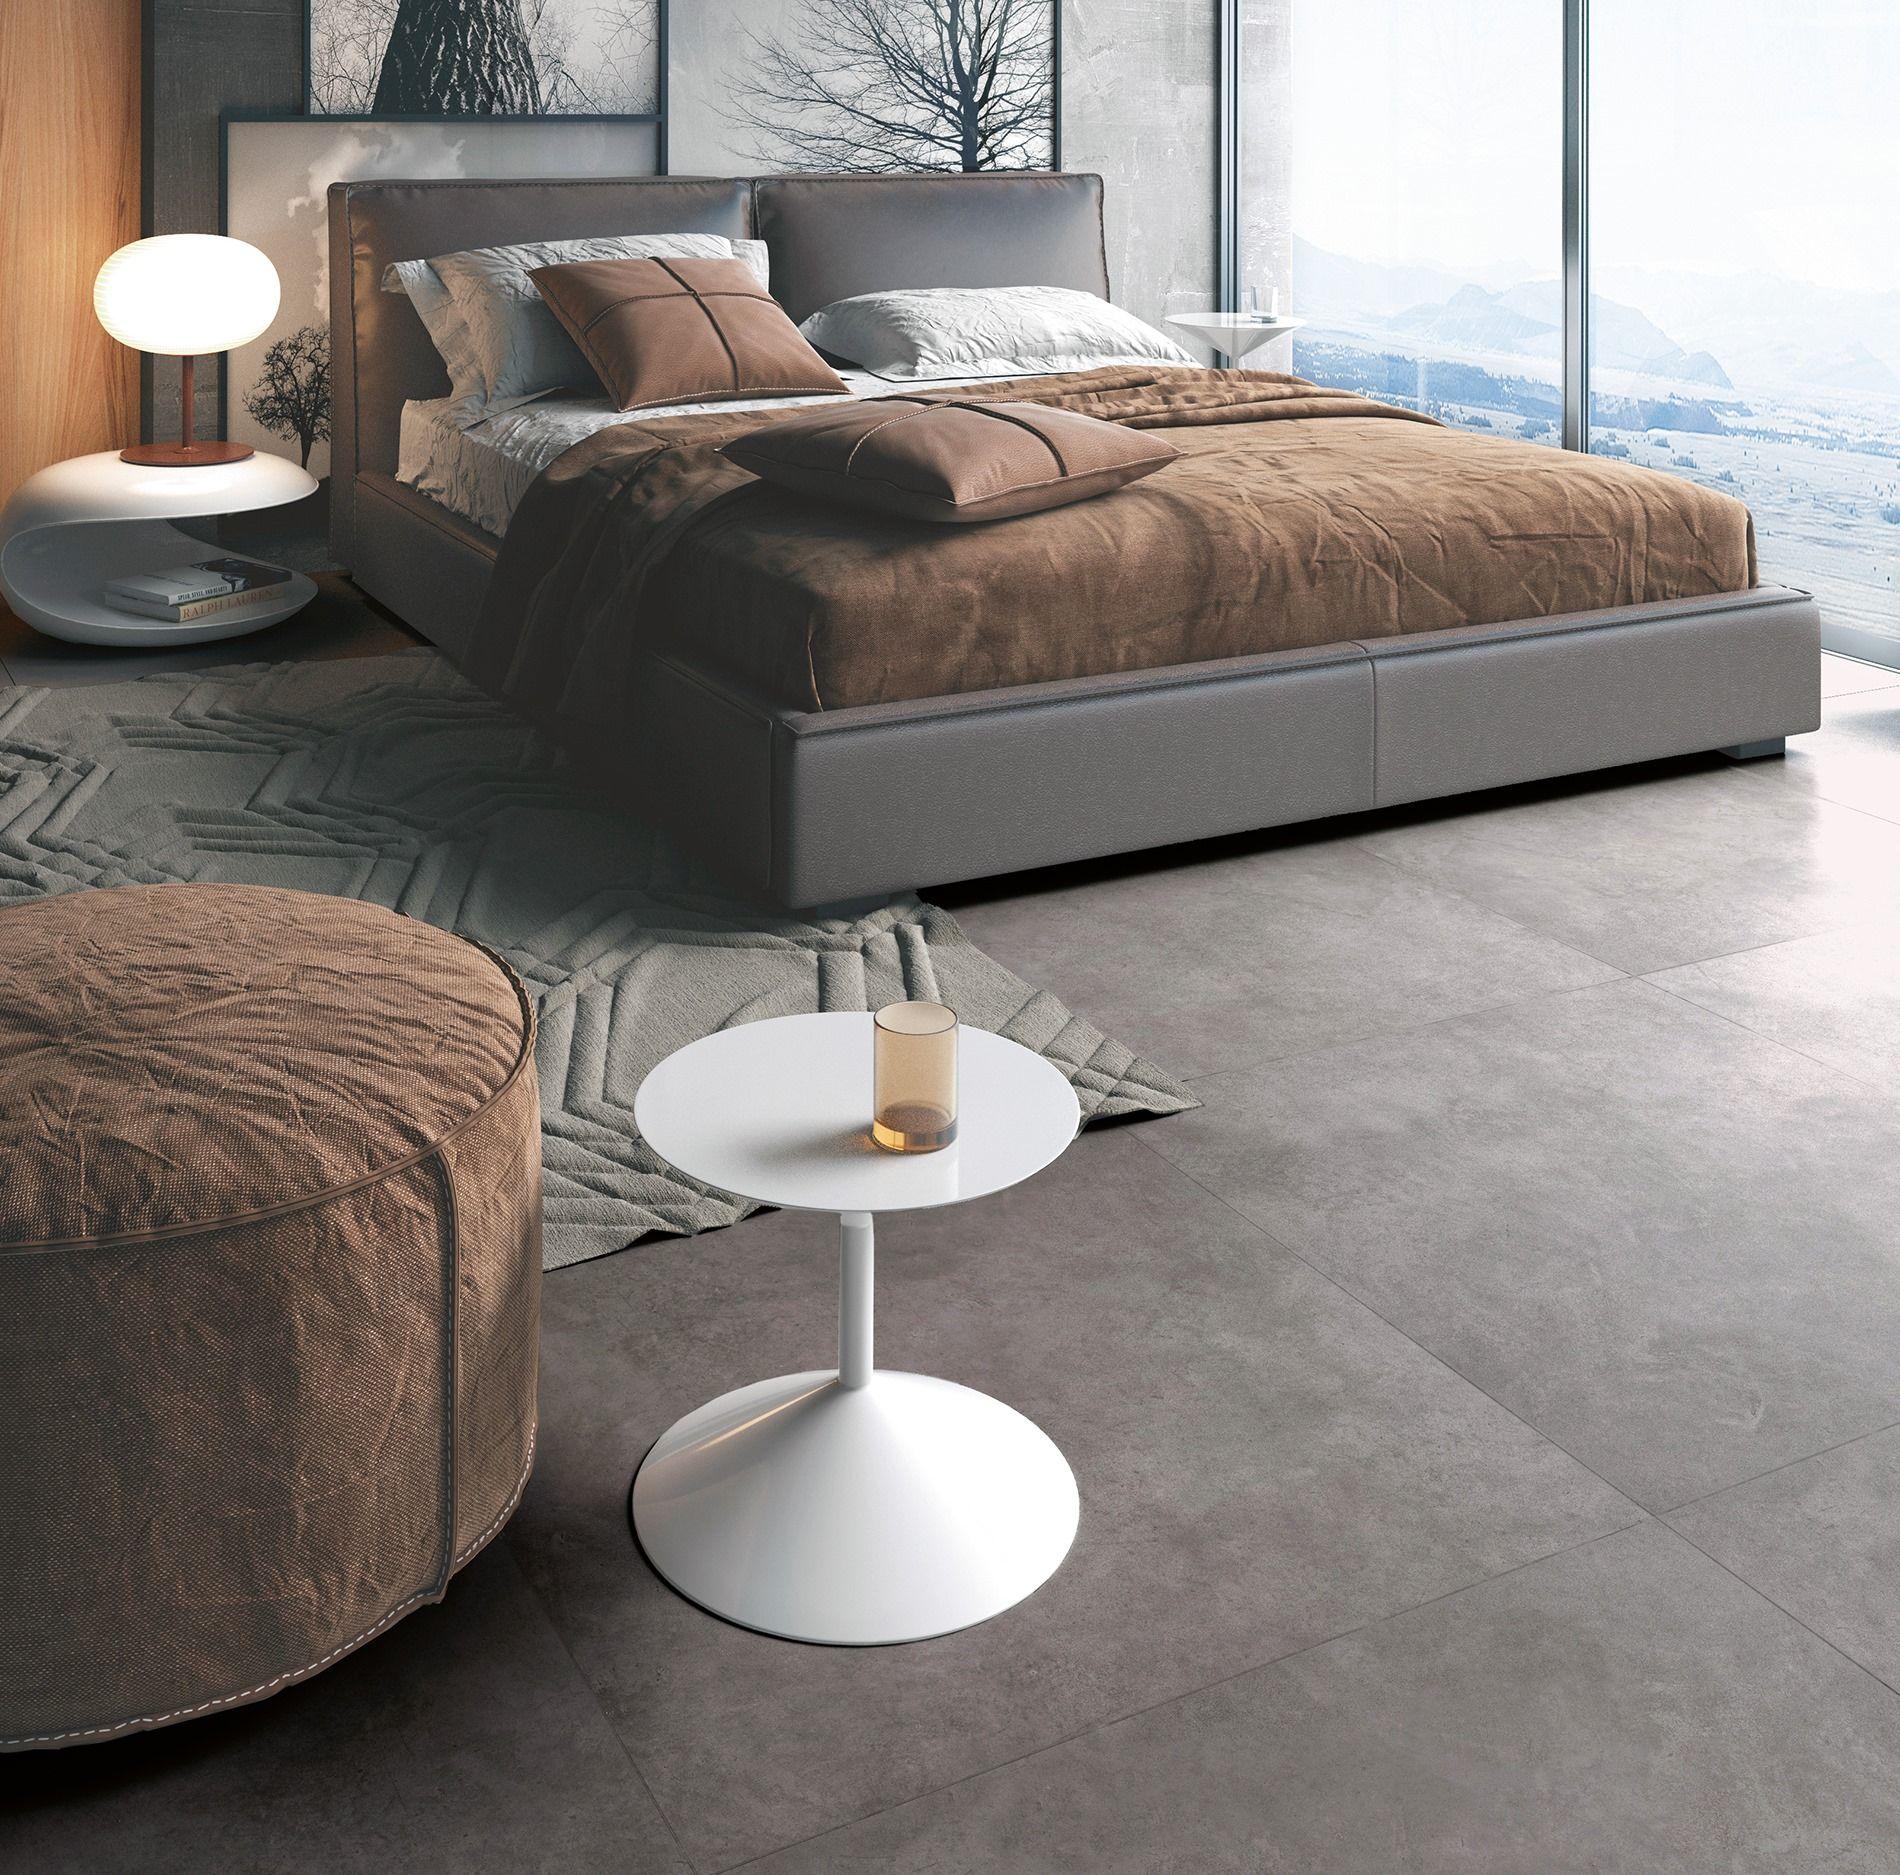 Chambre Design En 2020 Chambre Design Decoration De Sol Design